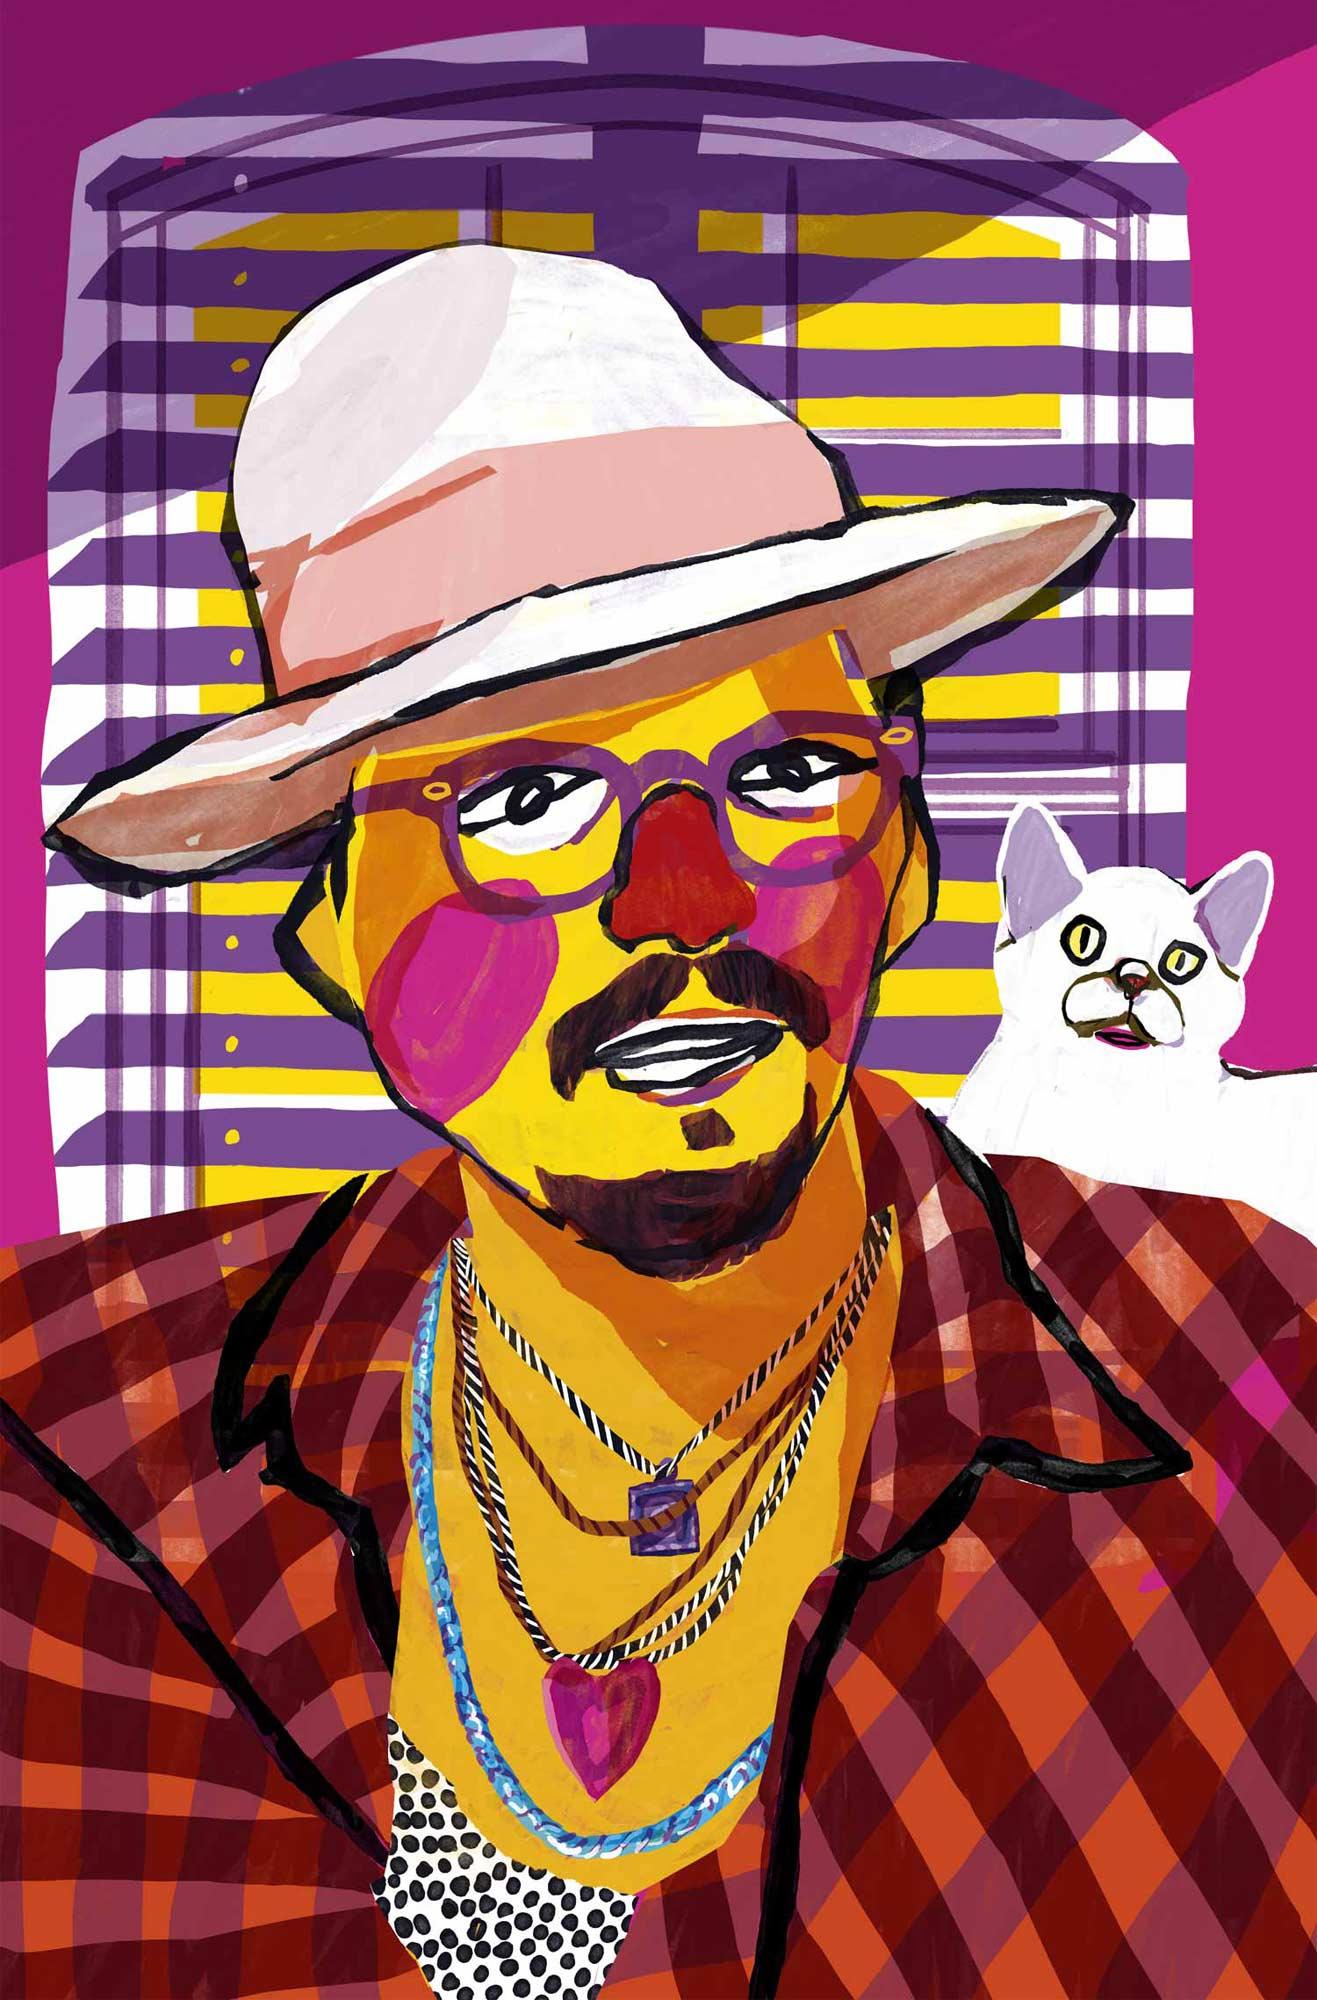 Mario Jodra illustration Art - Johnny Goatee wearing a hat and a cat